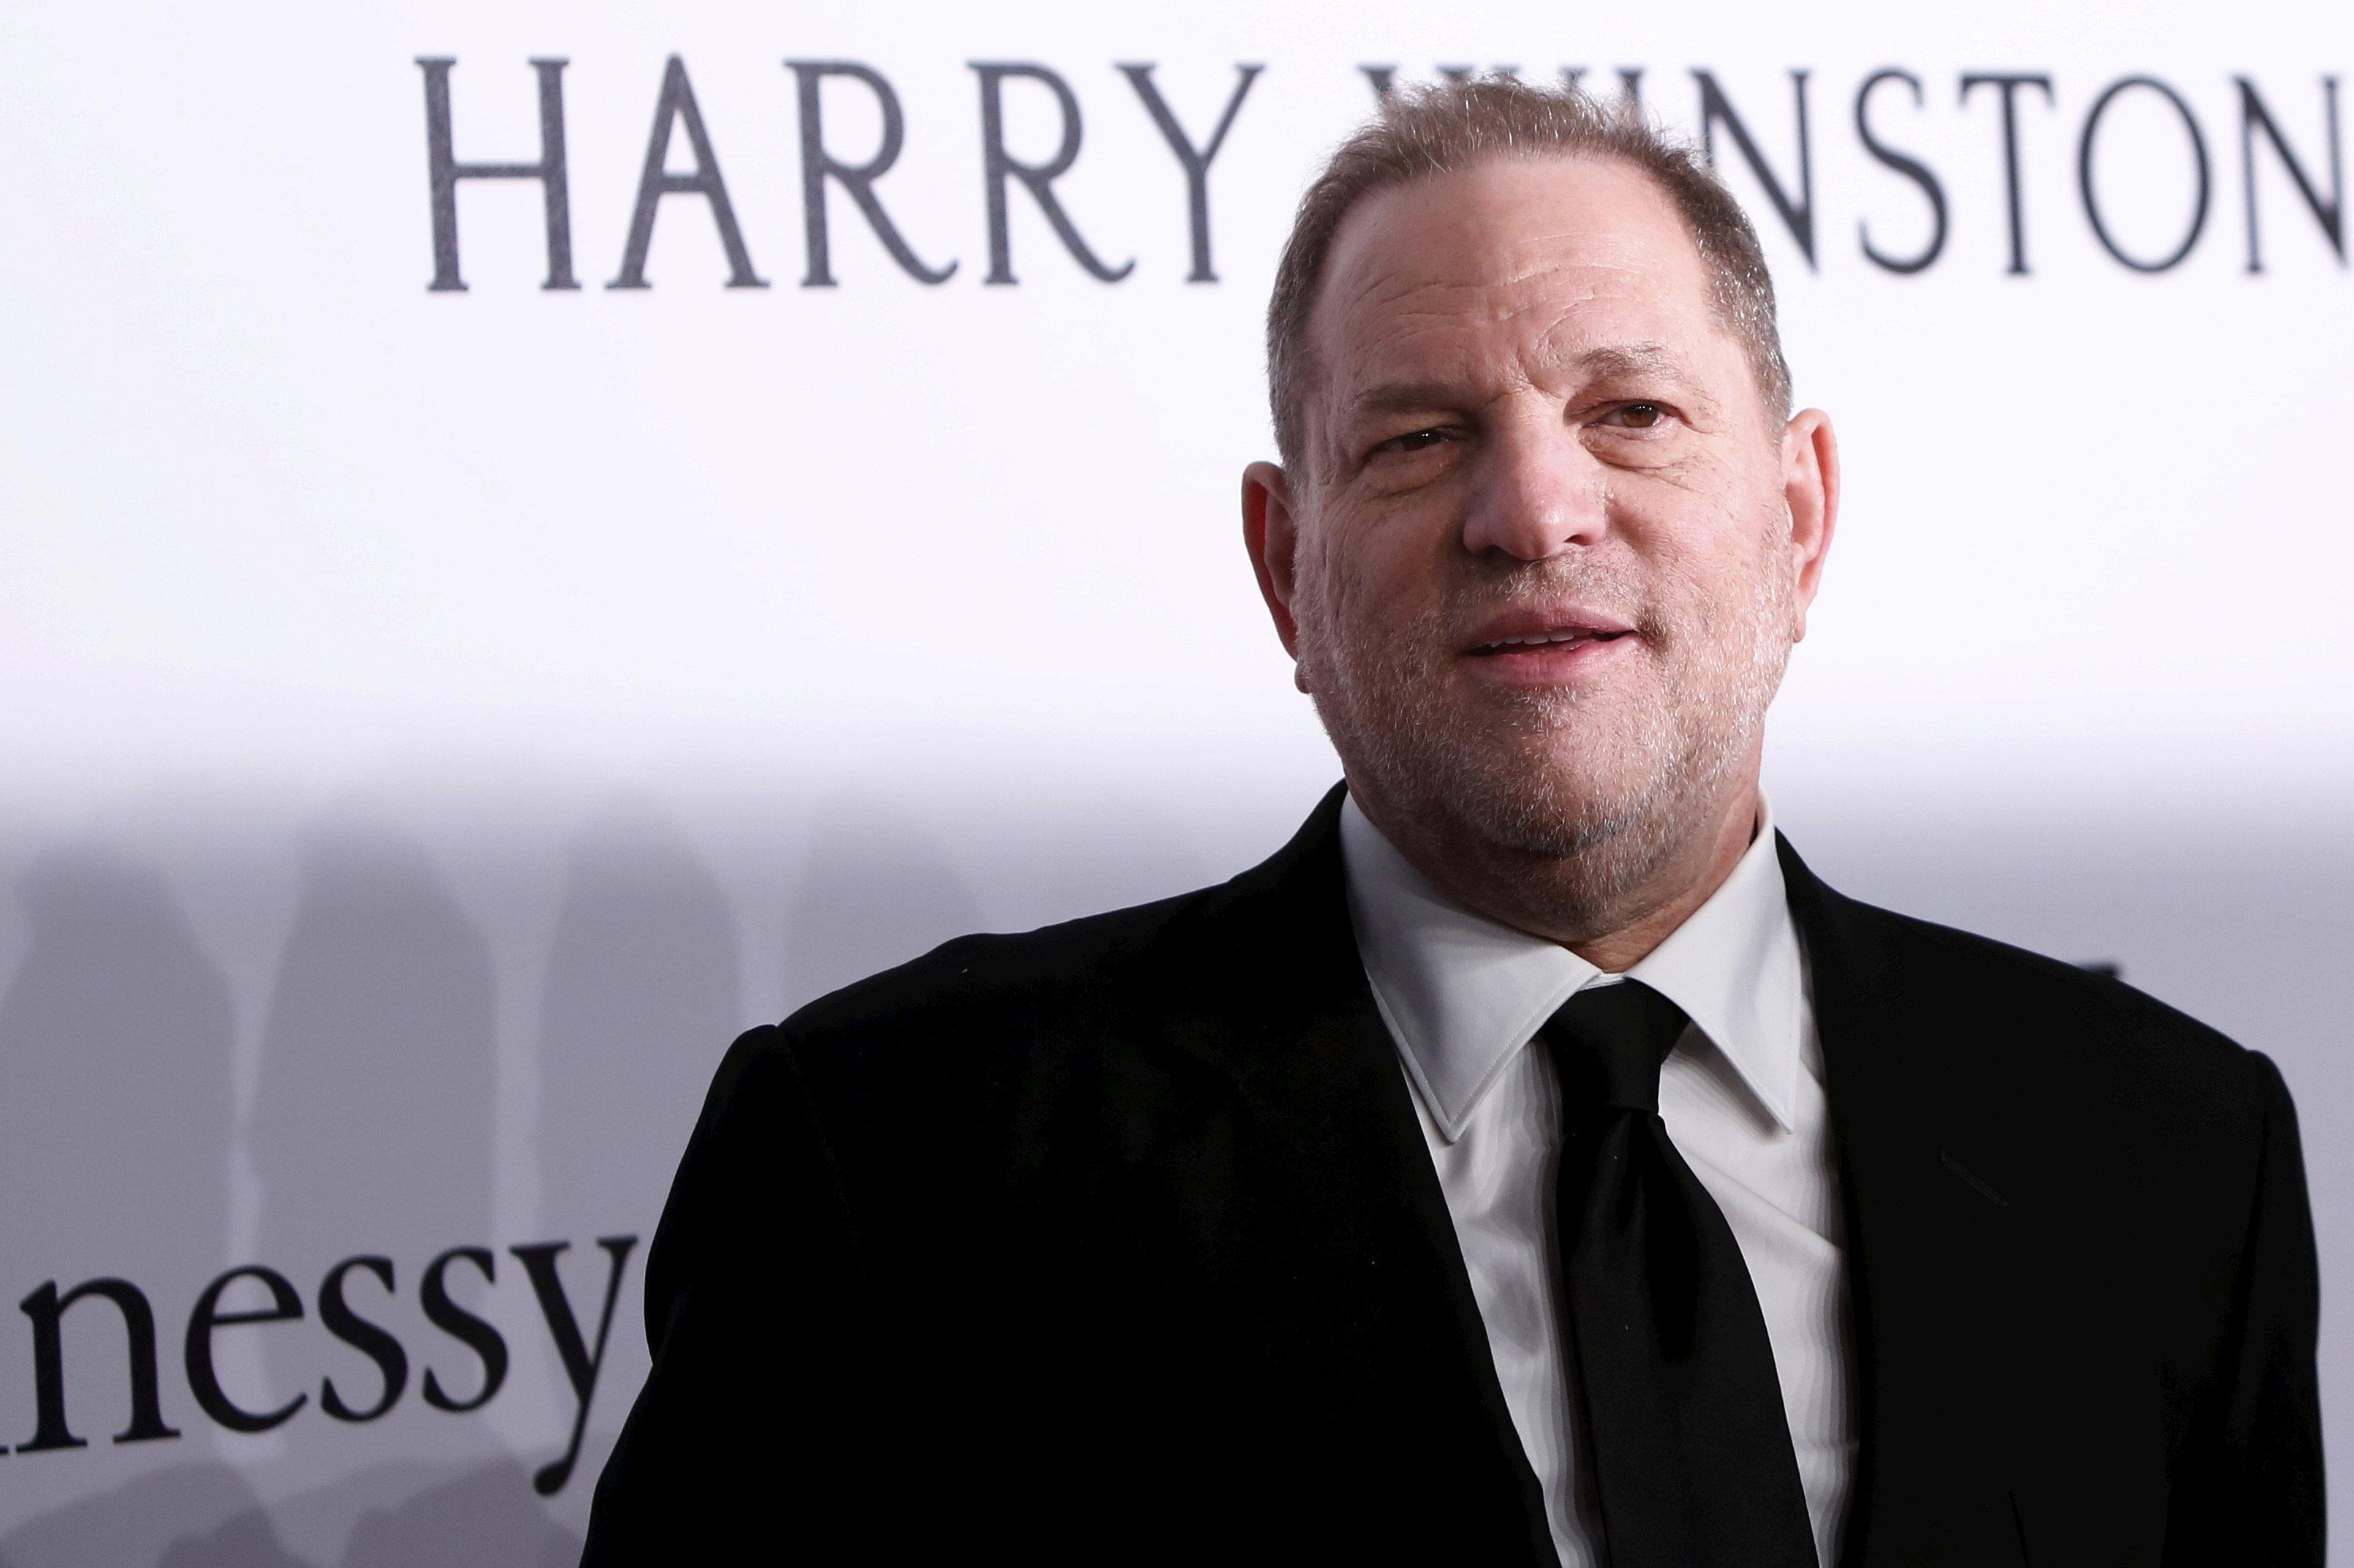 Film producer Harvey Weinstein attends the 2016 amfAR New York Gala at Cipriani Wall Street in Manhattan, New York